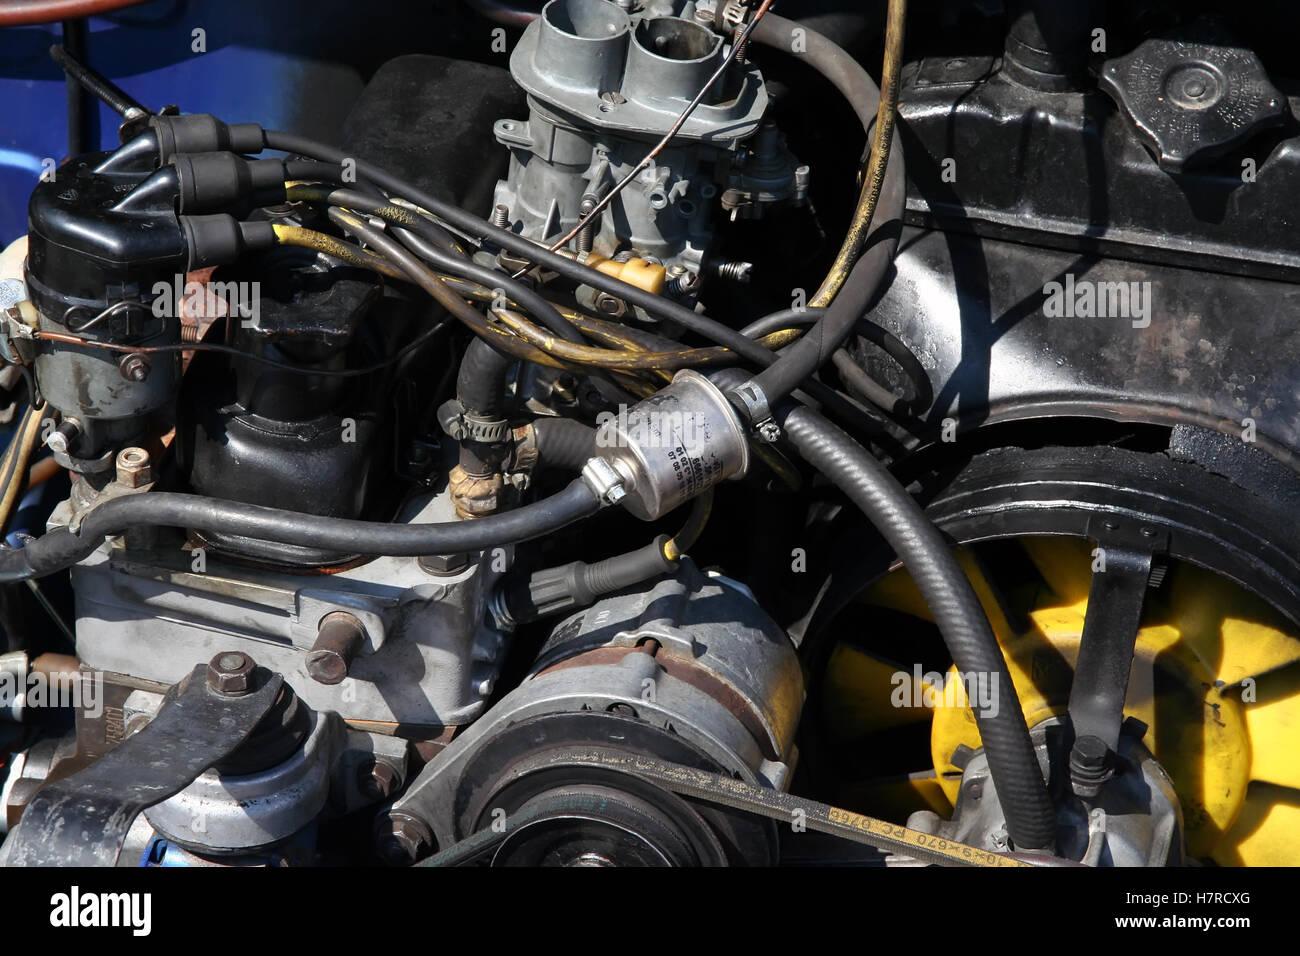 Turbo Parts Stockfotos & Turbo Parts Bilder - Alamy